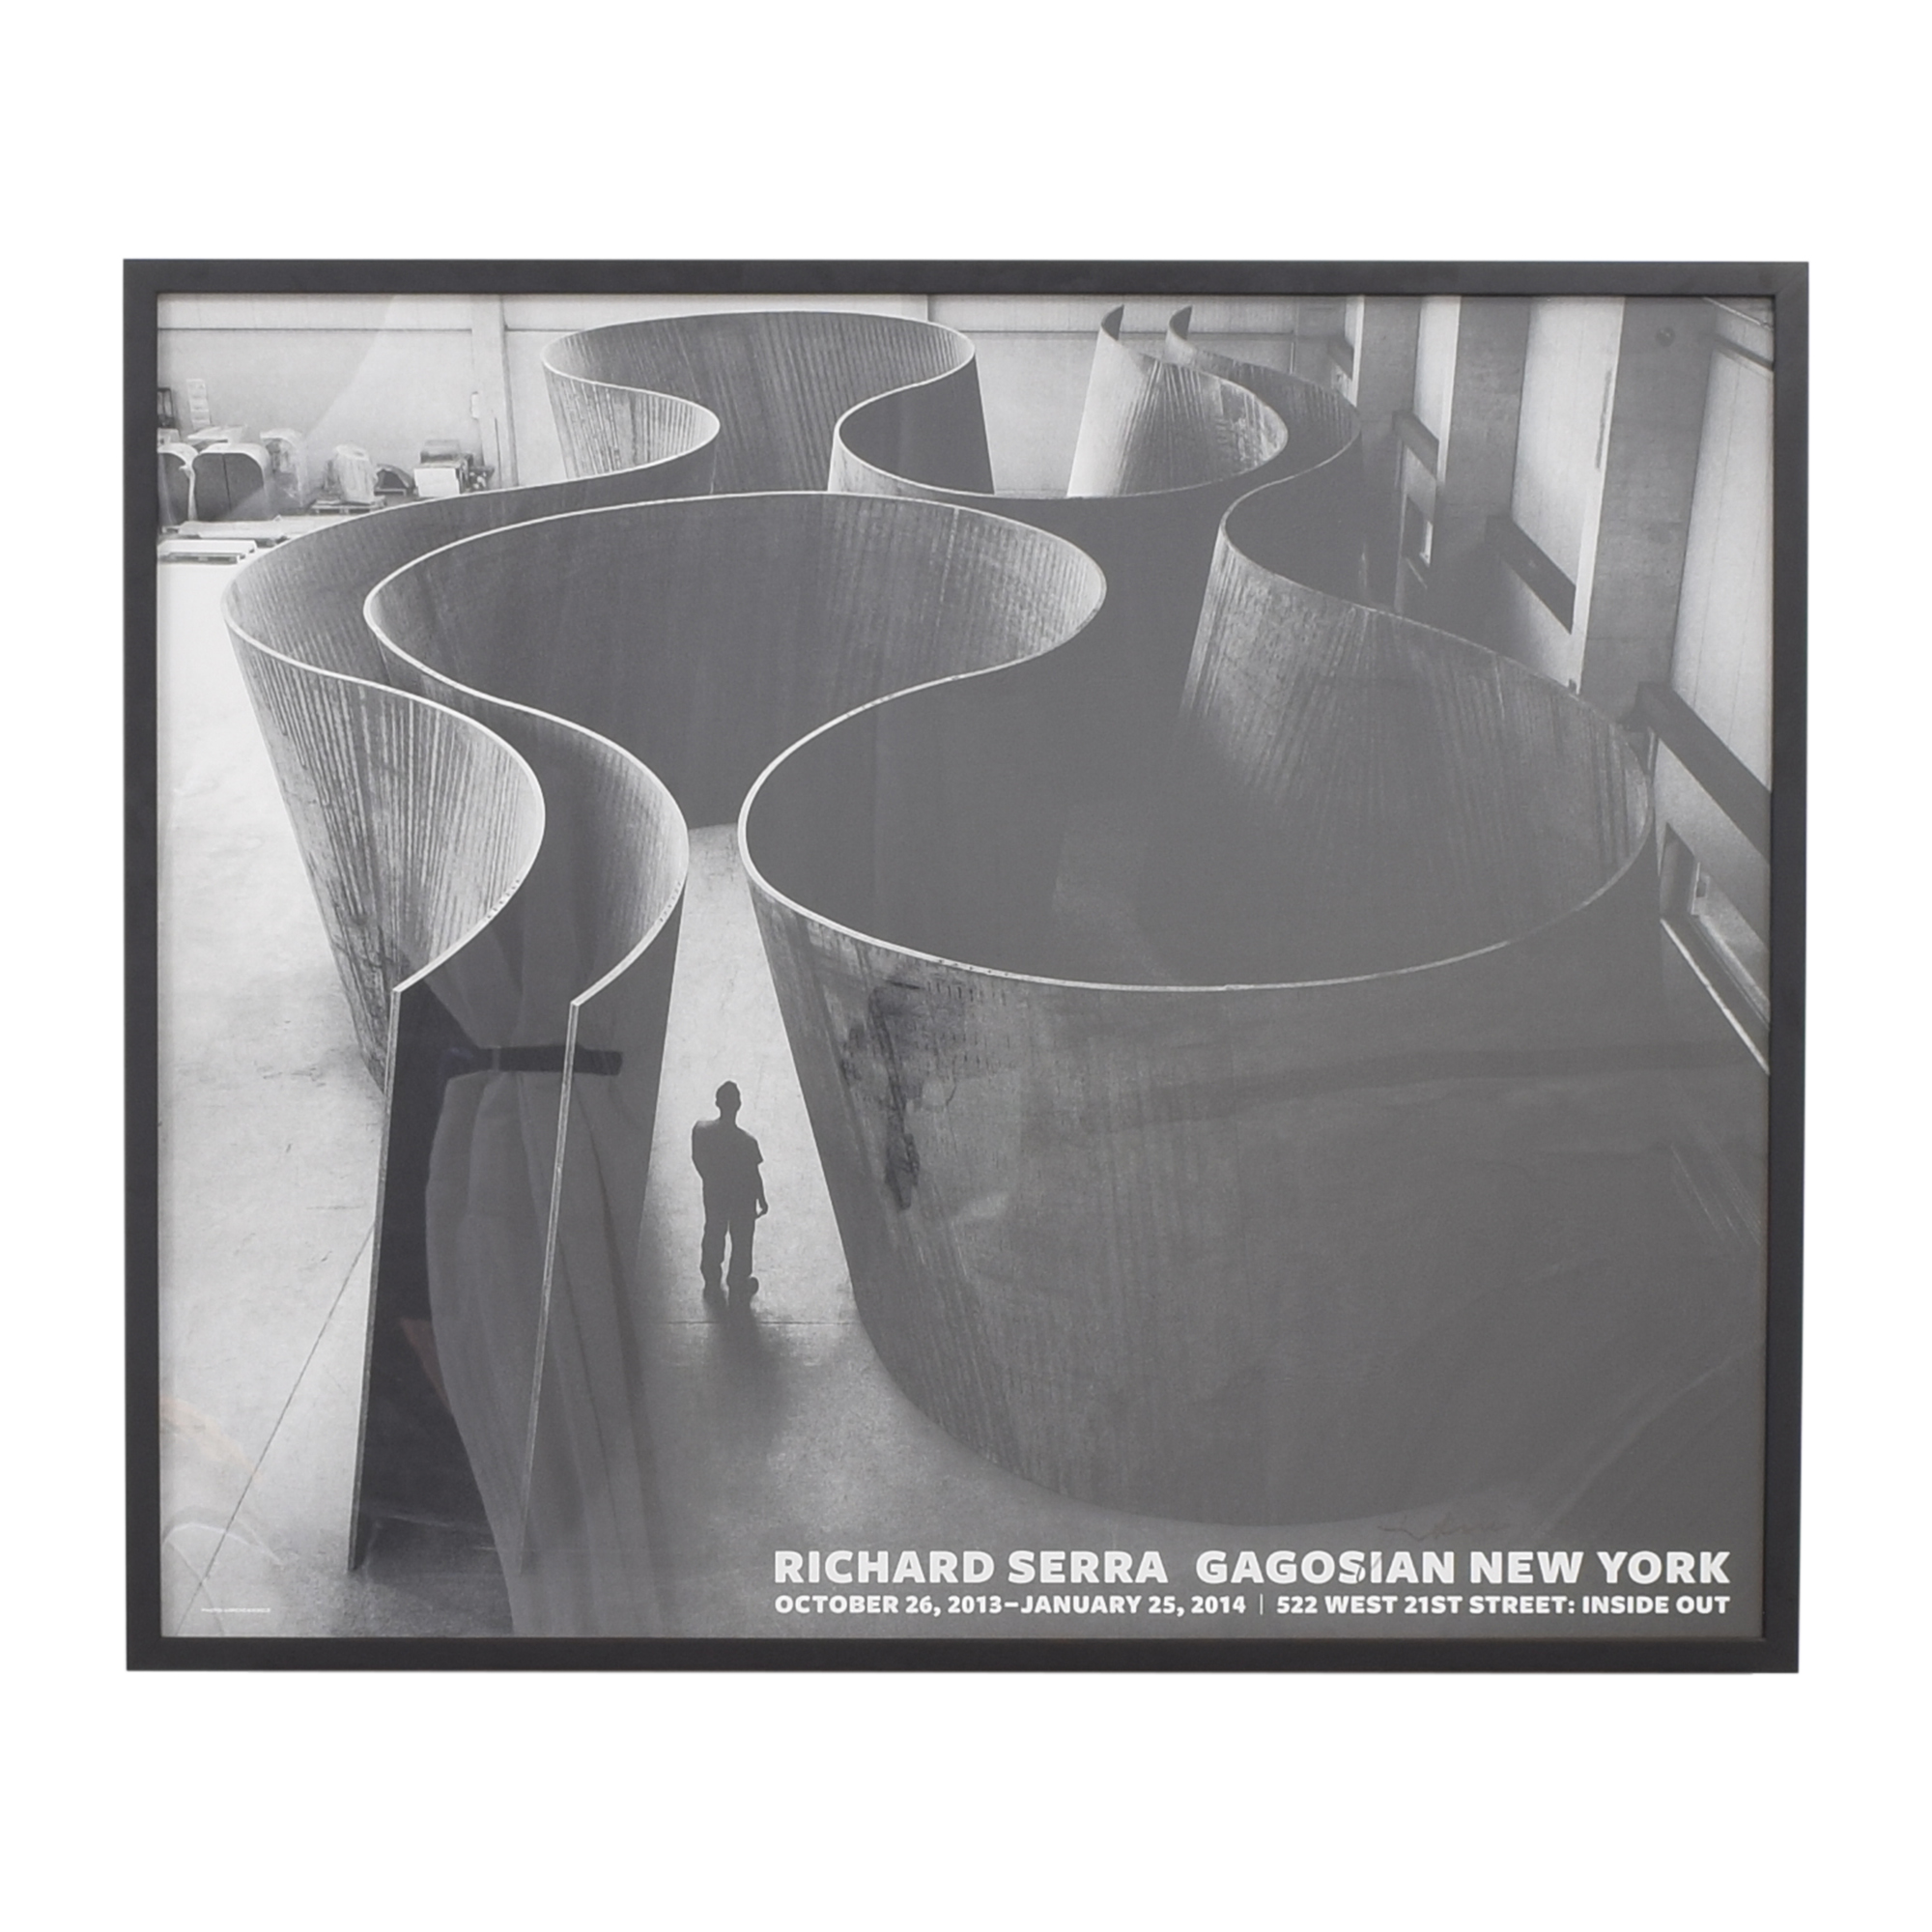 buy Gagosian Richard Serra Signed Framed Poster Gagosian Wall Art